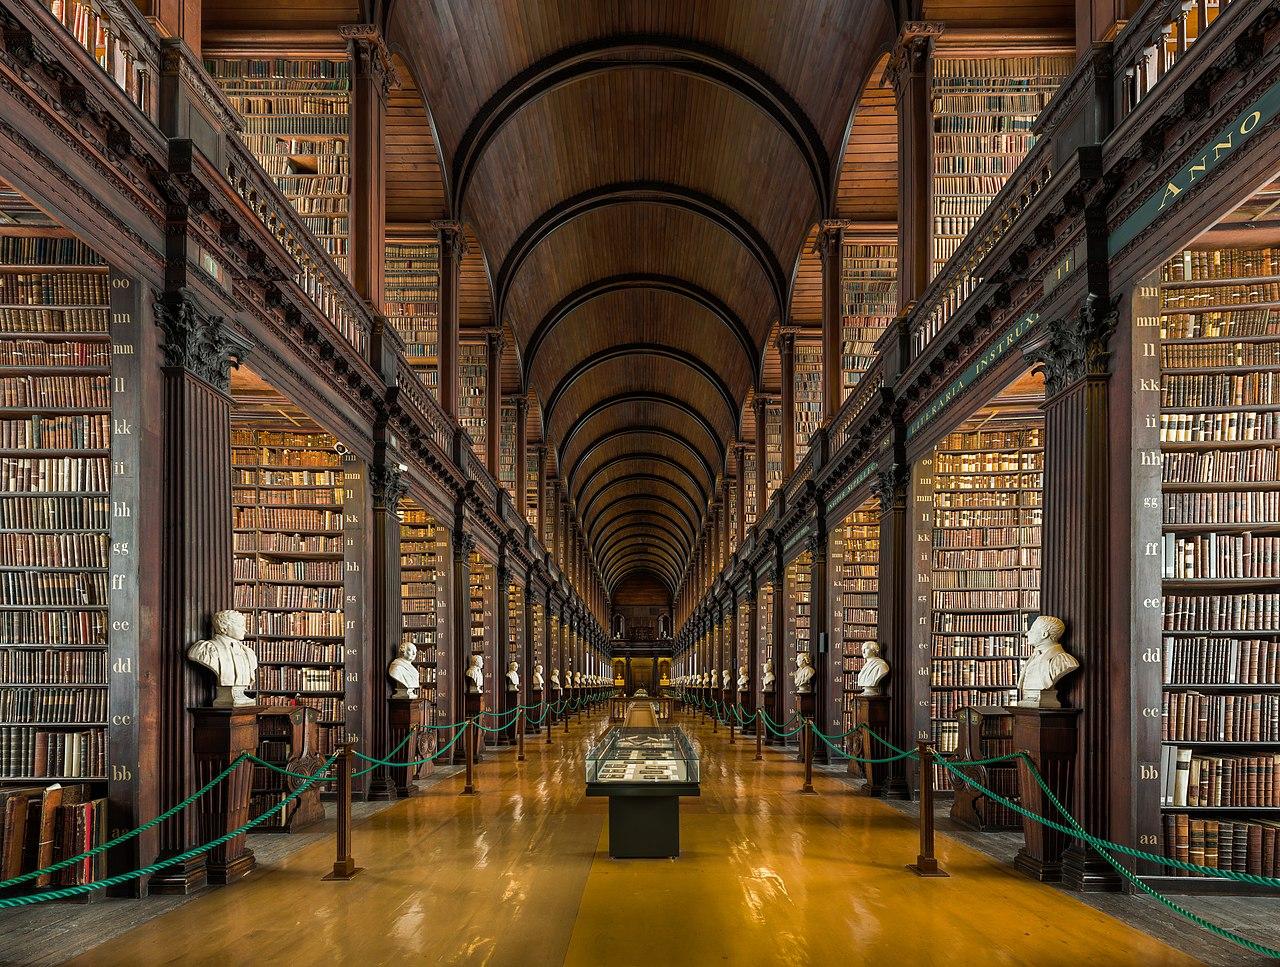 1280px-Long_Room_Interior,_Trinity_College_Dublin,_Ireland_-_Diliff